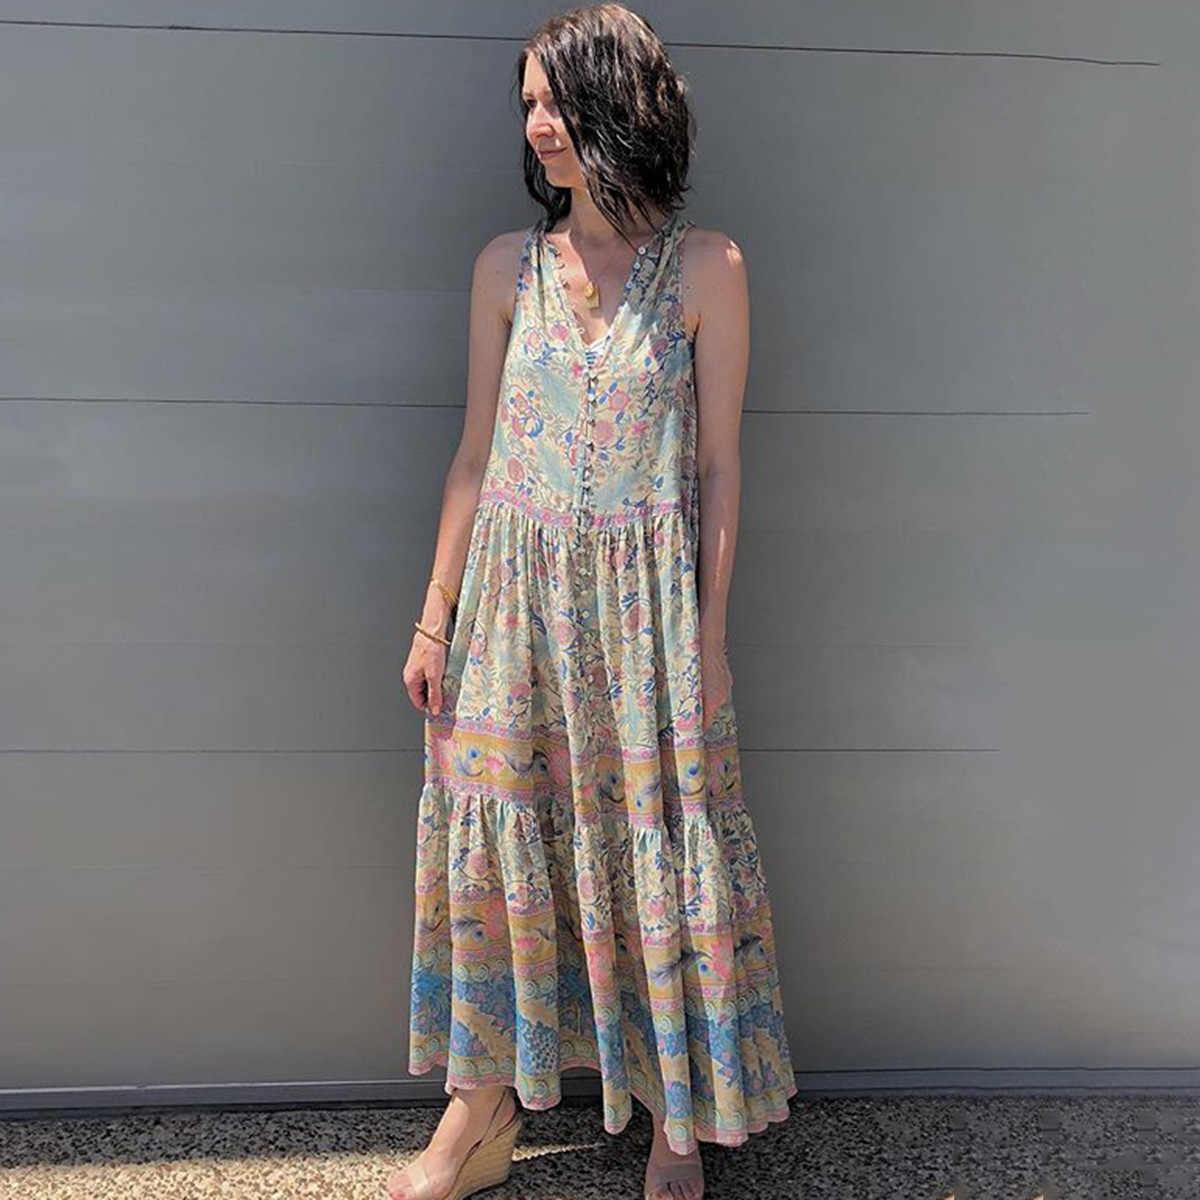 e4ce9f02b5e Jastie Oasis Maxi Dress Gypsy Print Maxi Dresses V-Neck Sleeveless Vest Beach  Long Dress